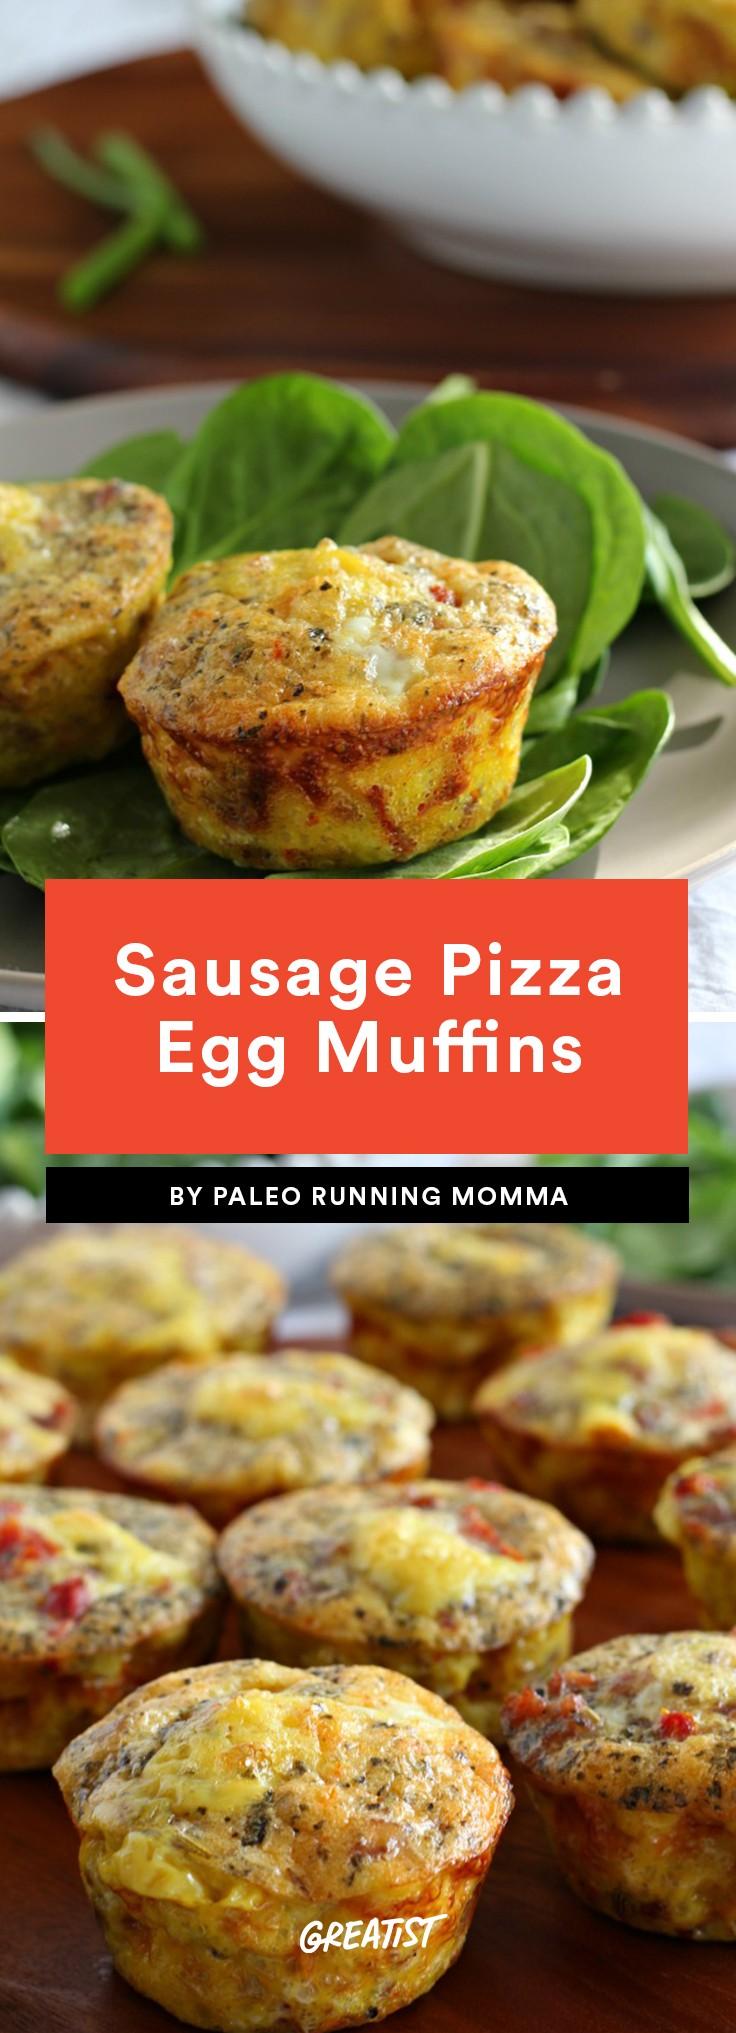 Sausage Pizza Egg Muffins Recipe